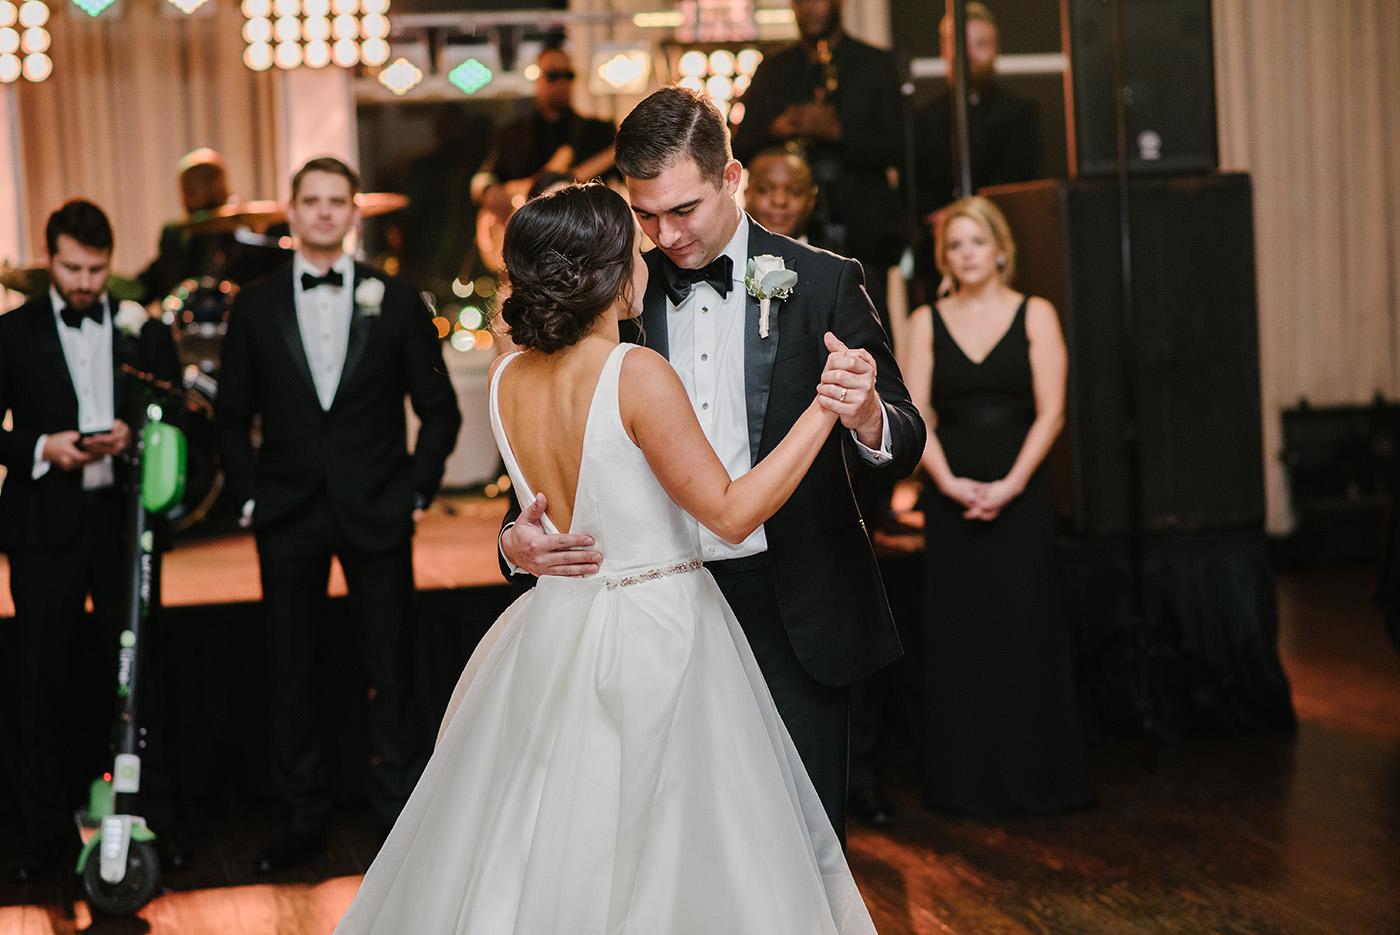 Dallas Wedding Planner - Winter Wedding at The Room on Main - Allday Events - 61.jpg